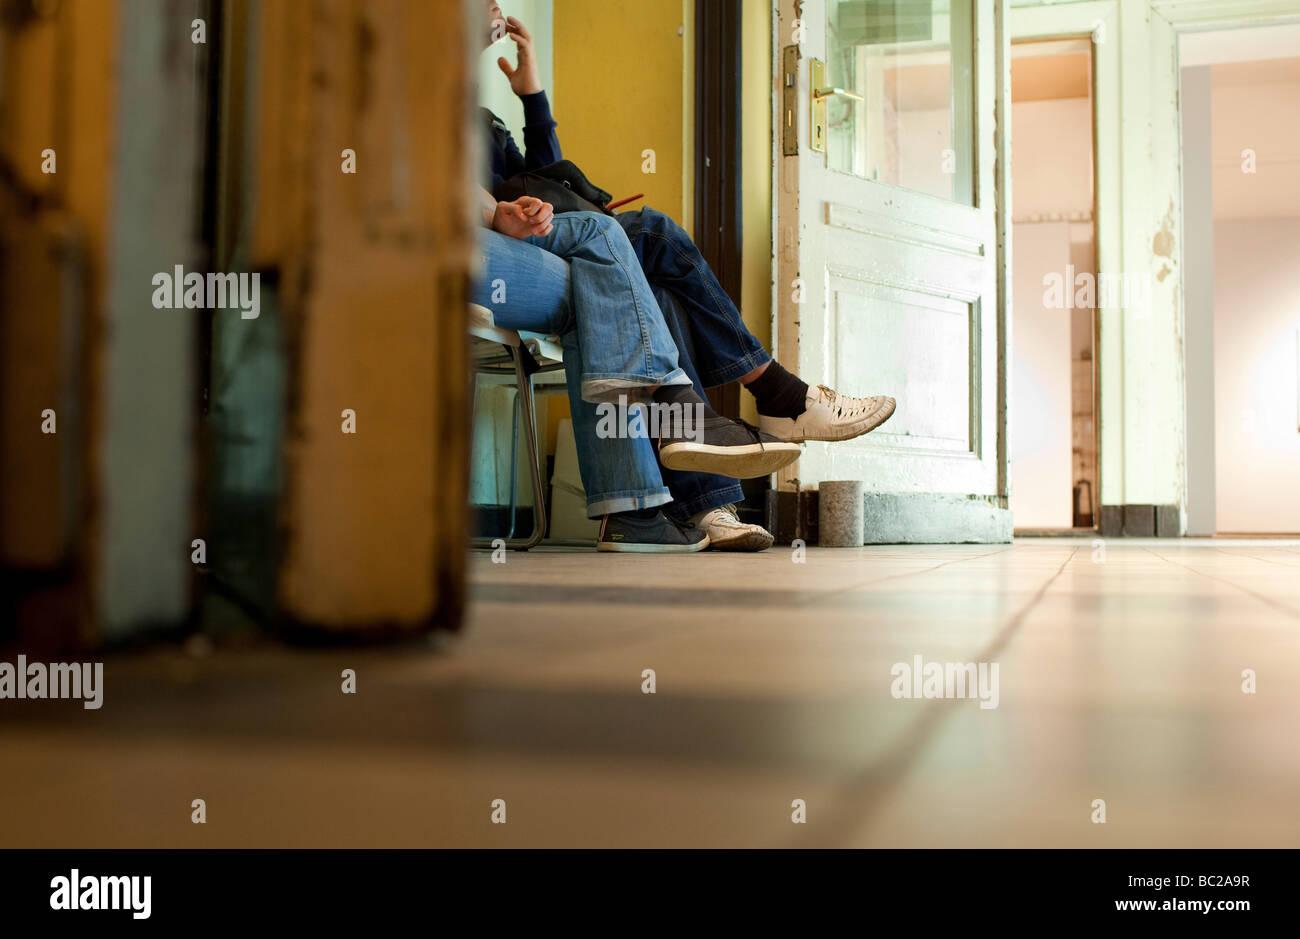 Employment center - Stock Image